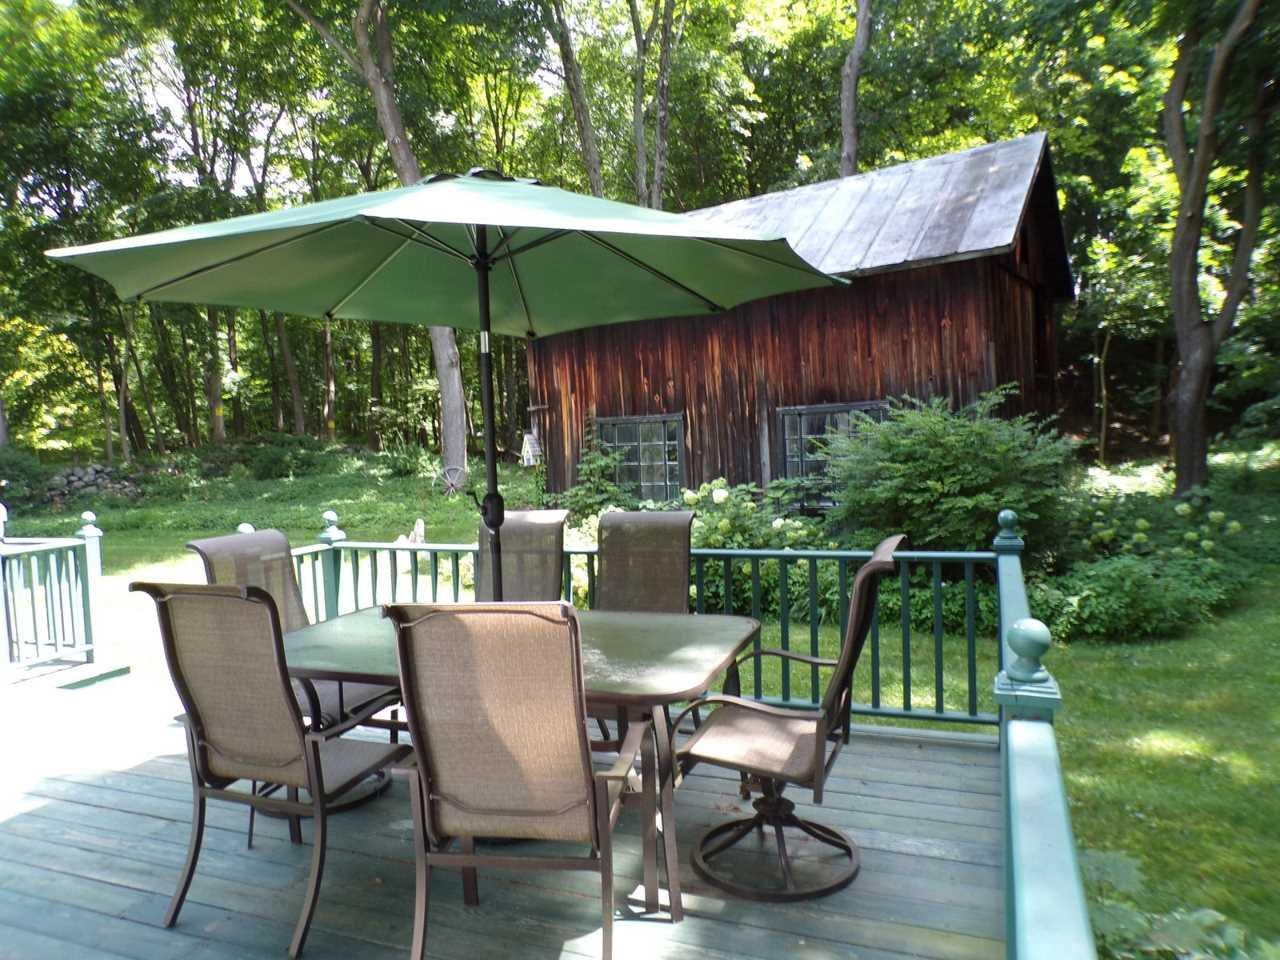 Additional photo for property listing at 16 MILLIS LANE 16 MILLIS LANE Stanfordville, New York 12581 United States